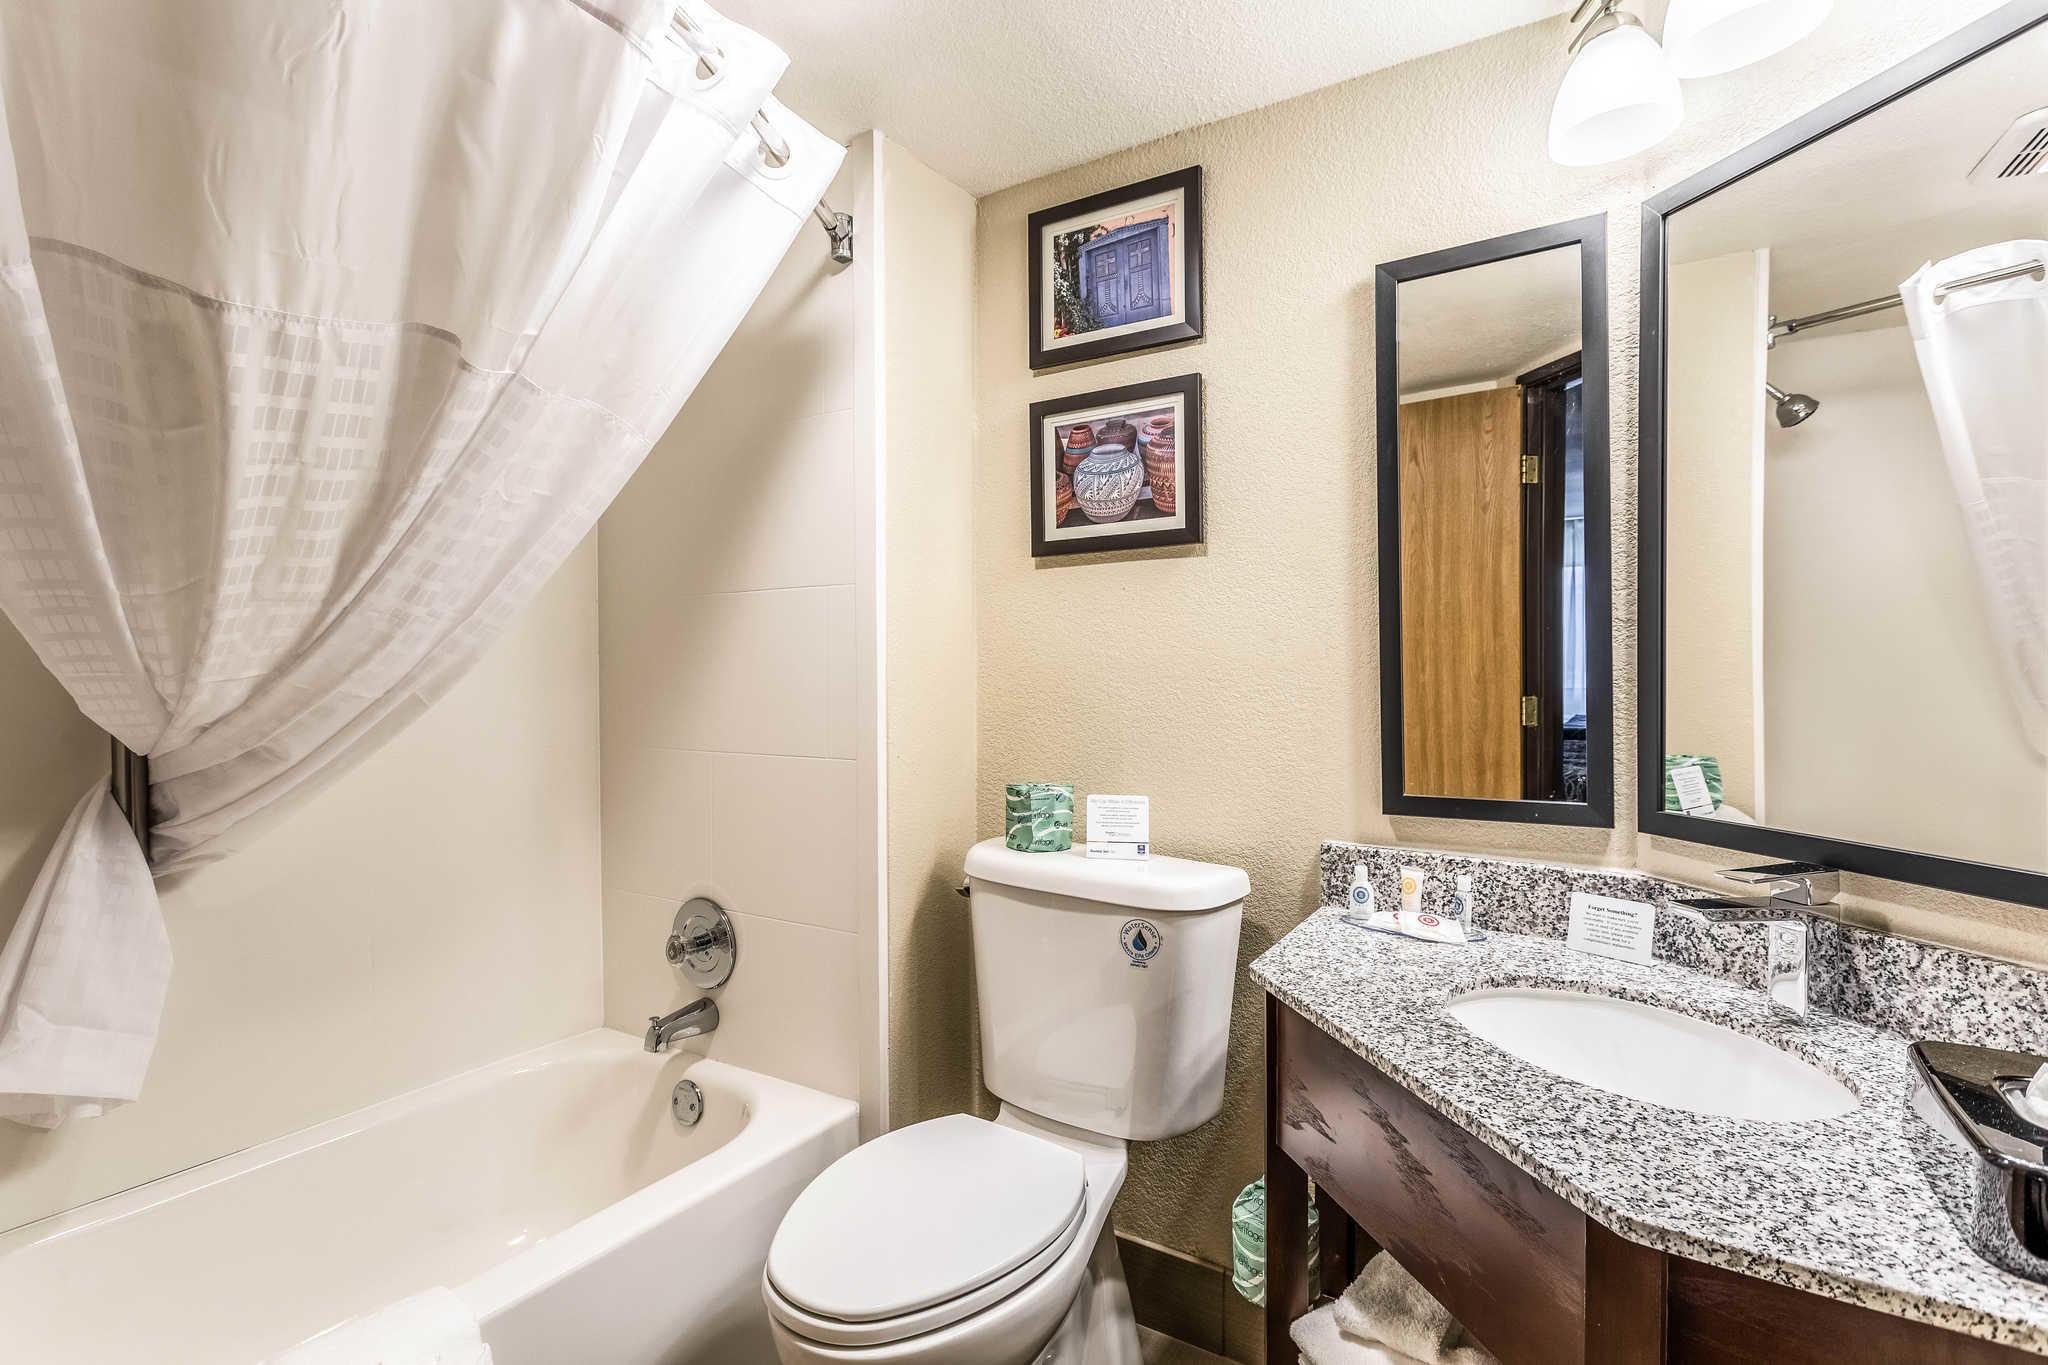 Comfort Inn & Suites Albuquerque Downtown image 17